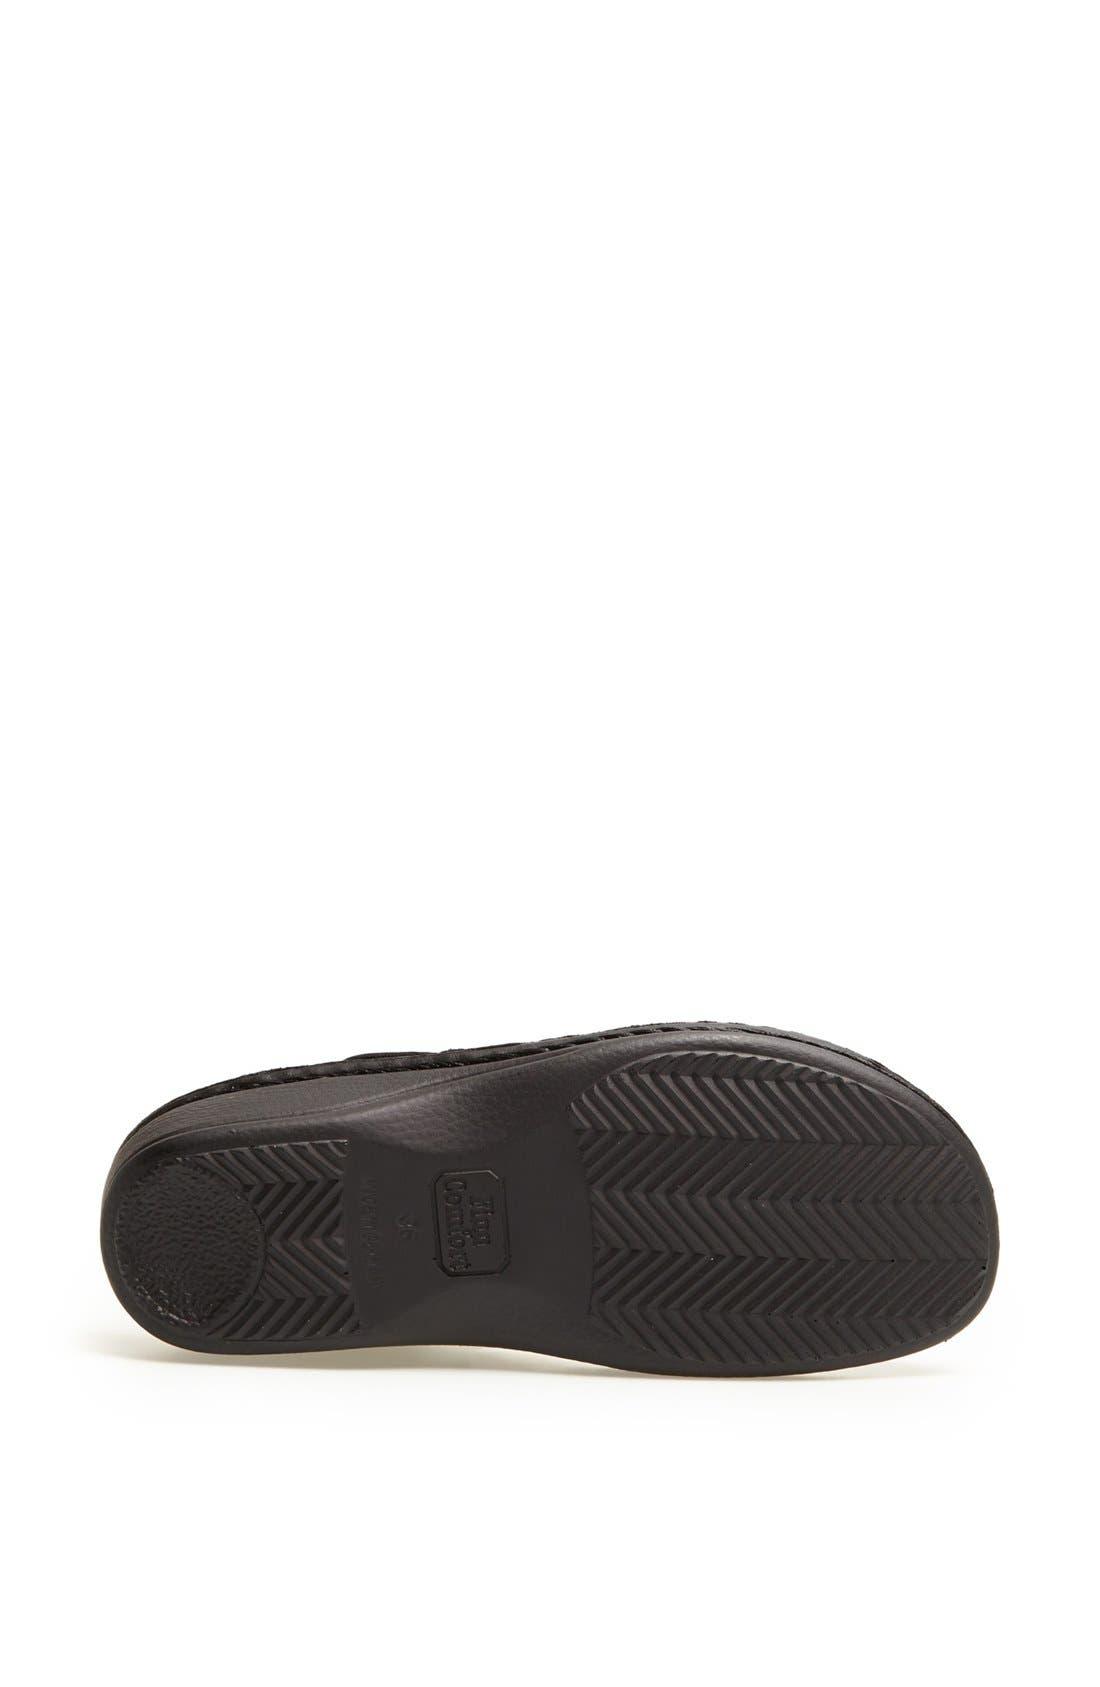 'Faro-S' Leather Sandal,                             Alternate thumbnail 4, color,